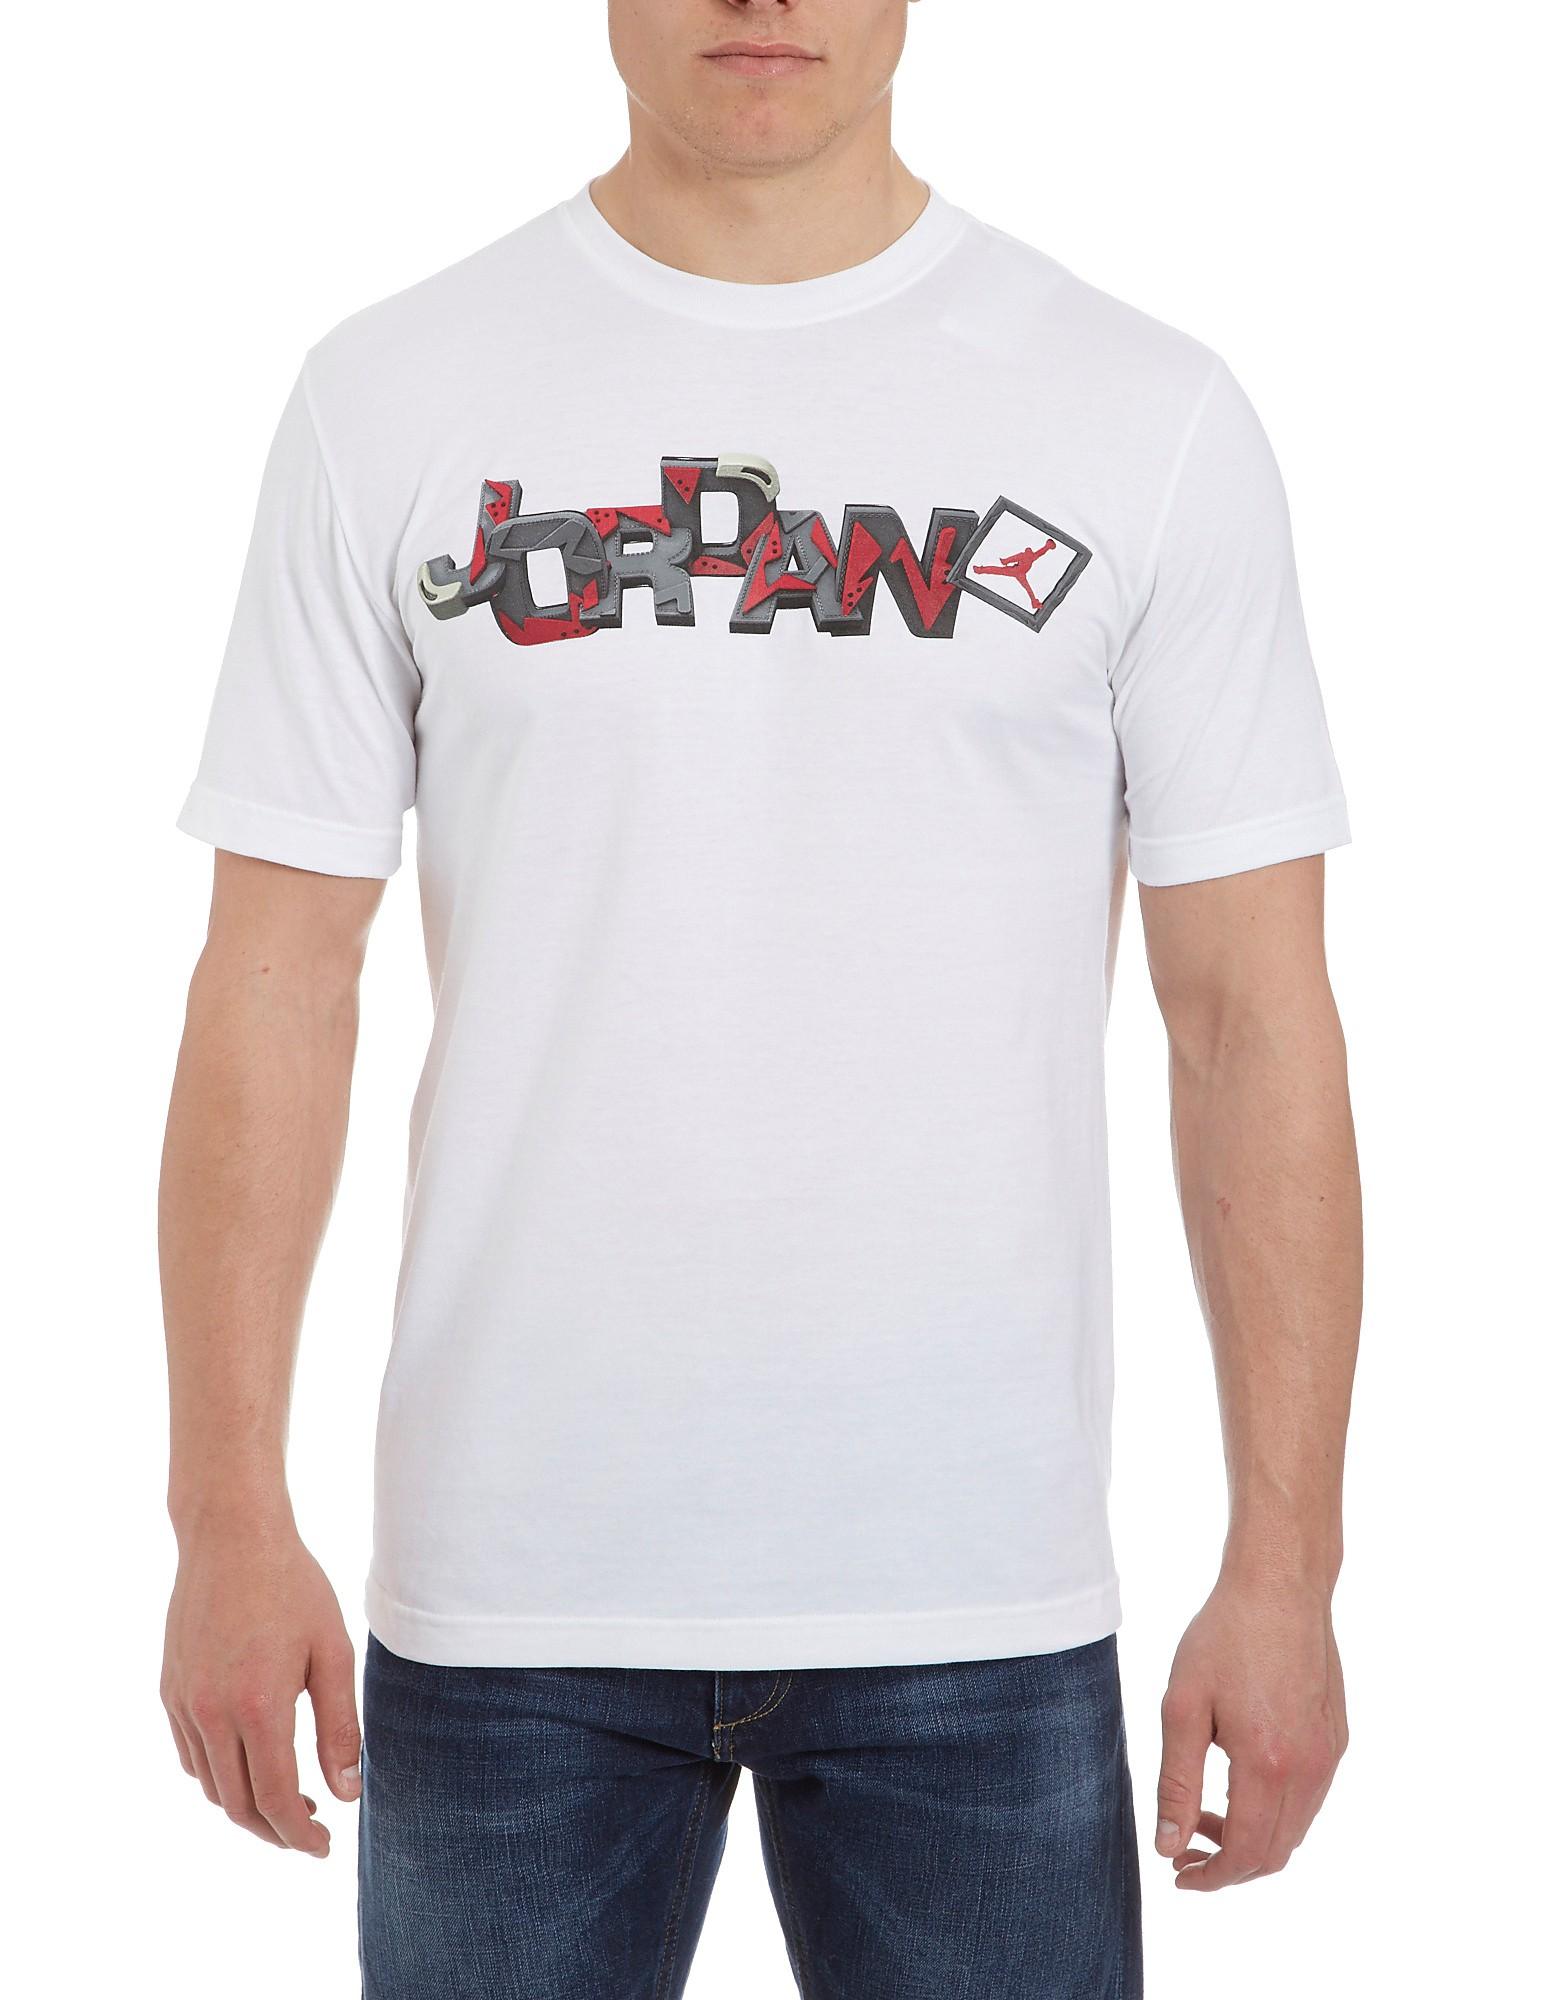 Jordan 23 Remix T-Shirt product image